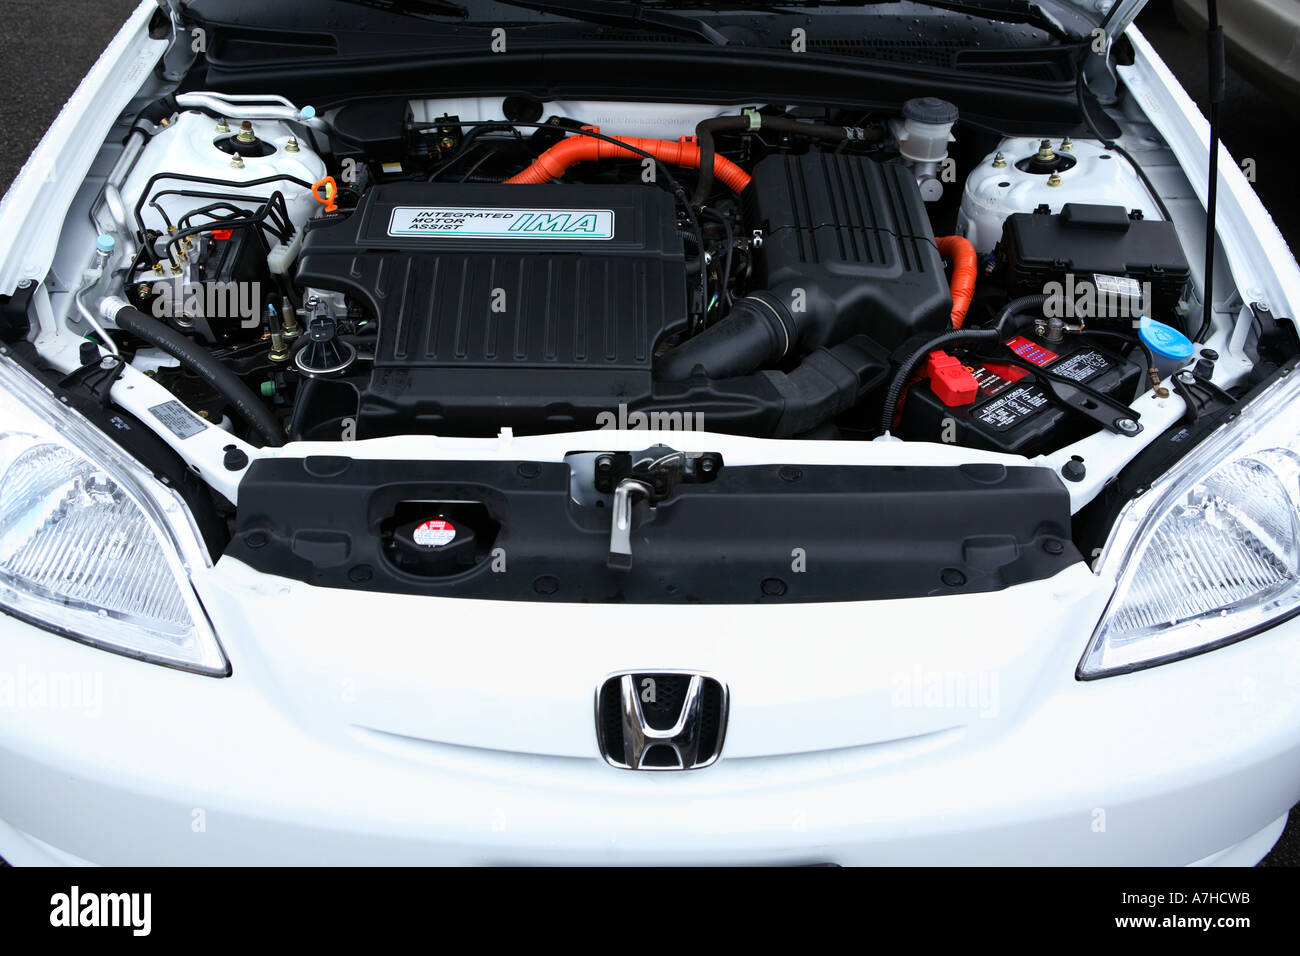 Under The Hood Of A 2003 Honda Civic Hybrid Car